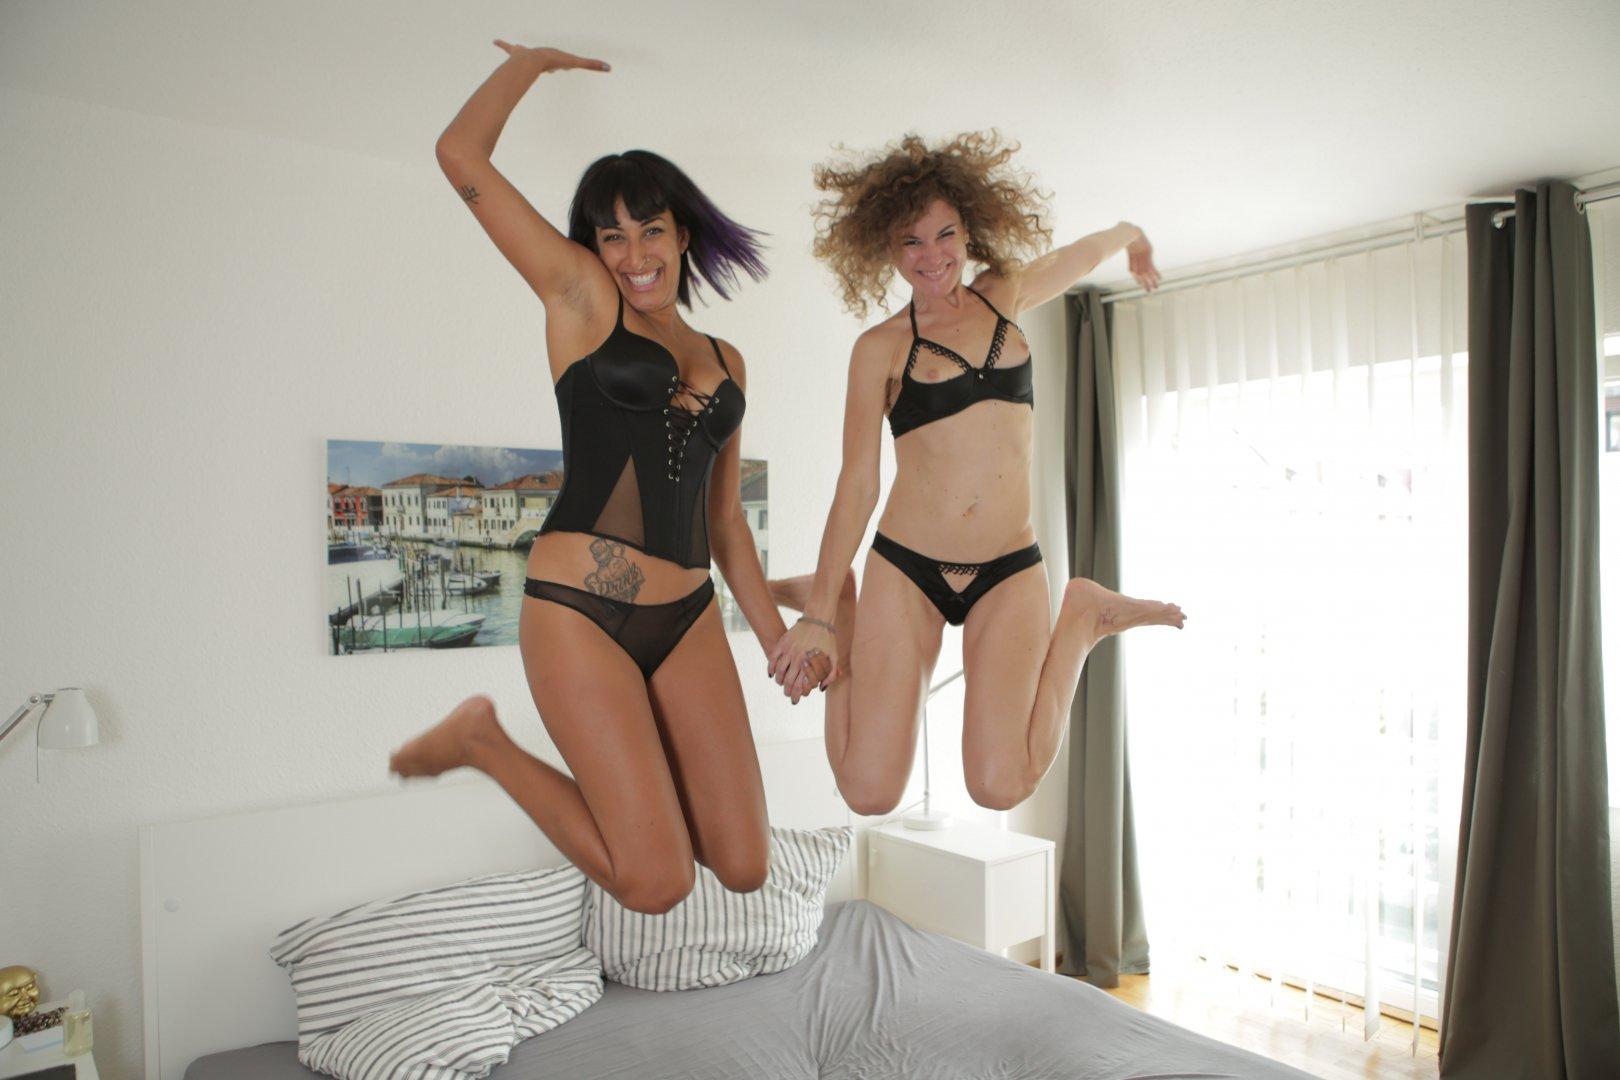 Ersties.com Foreplay With Kali And Bruna